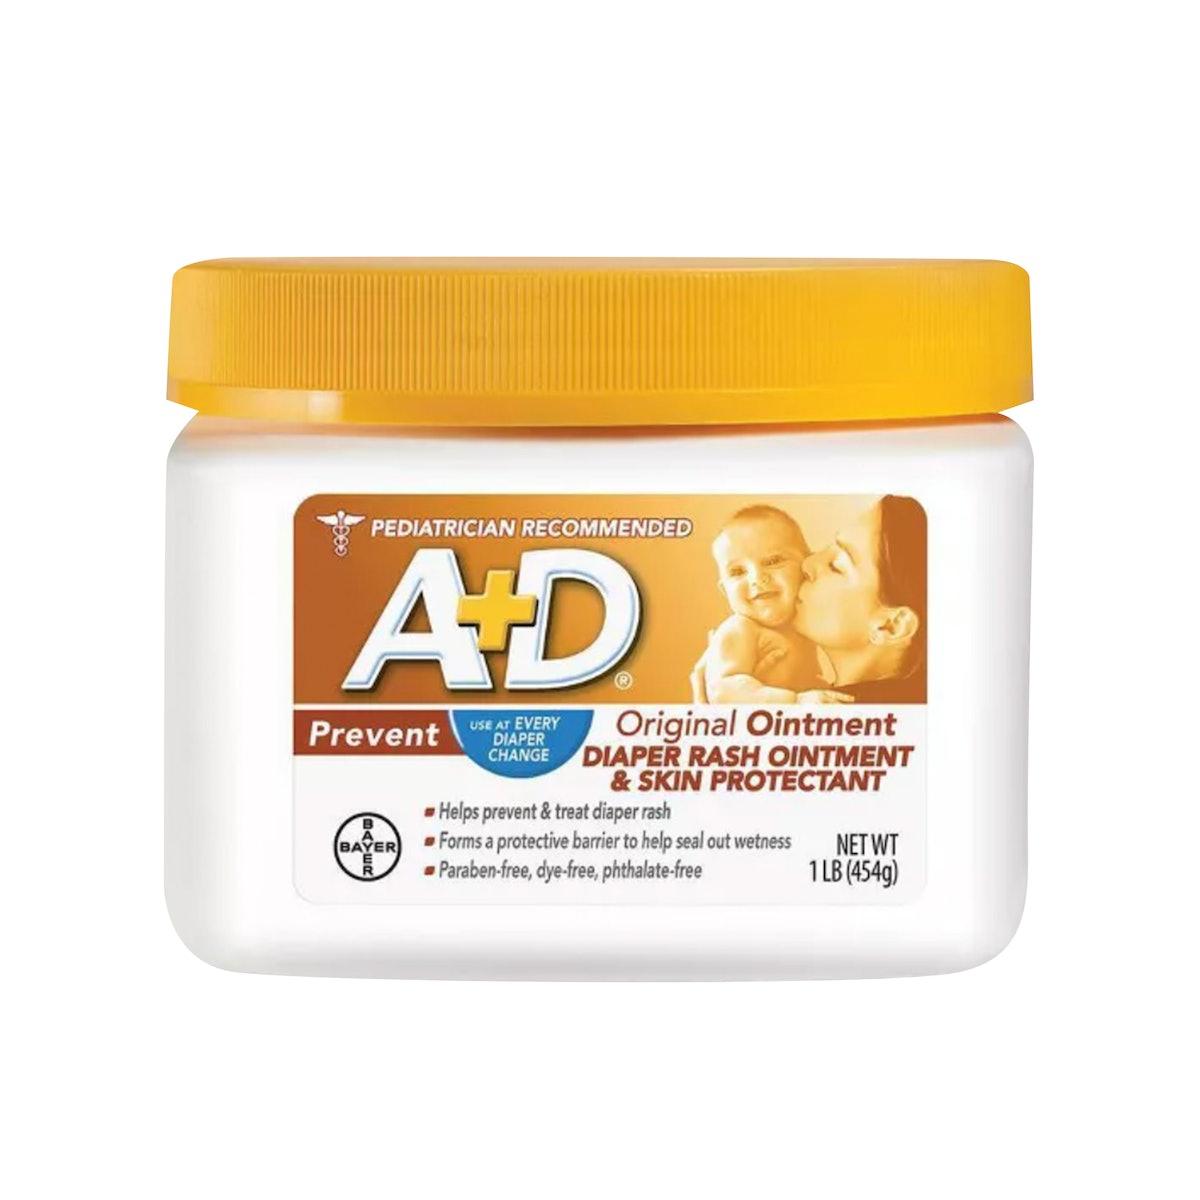 A+D Original Diaper Rash Ointment — 16 Oz.